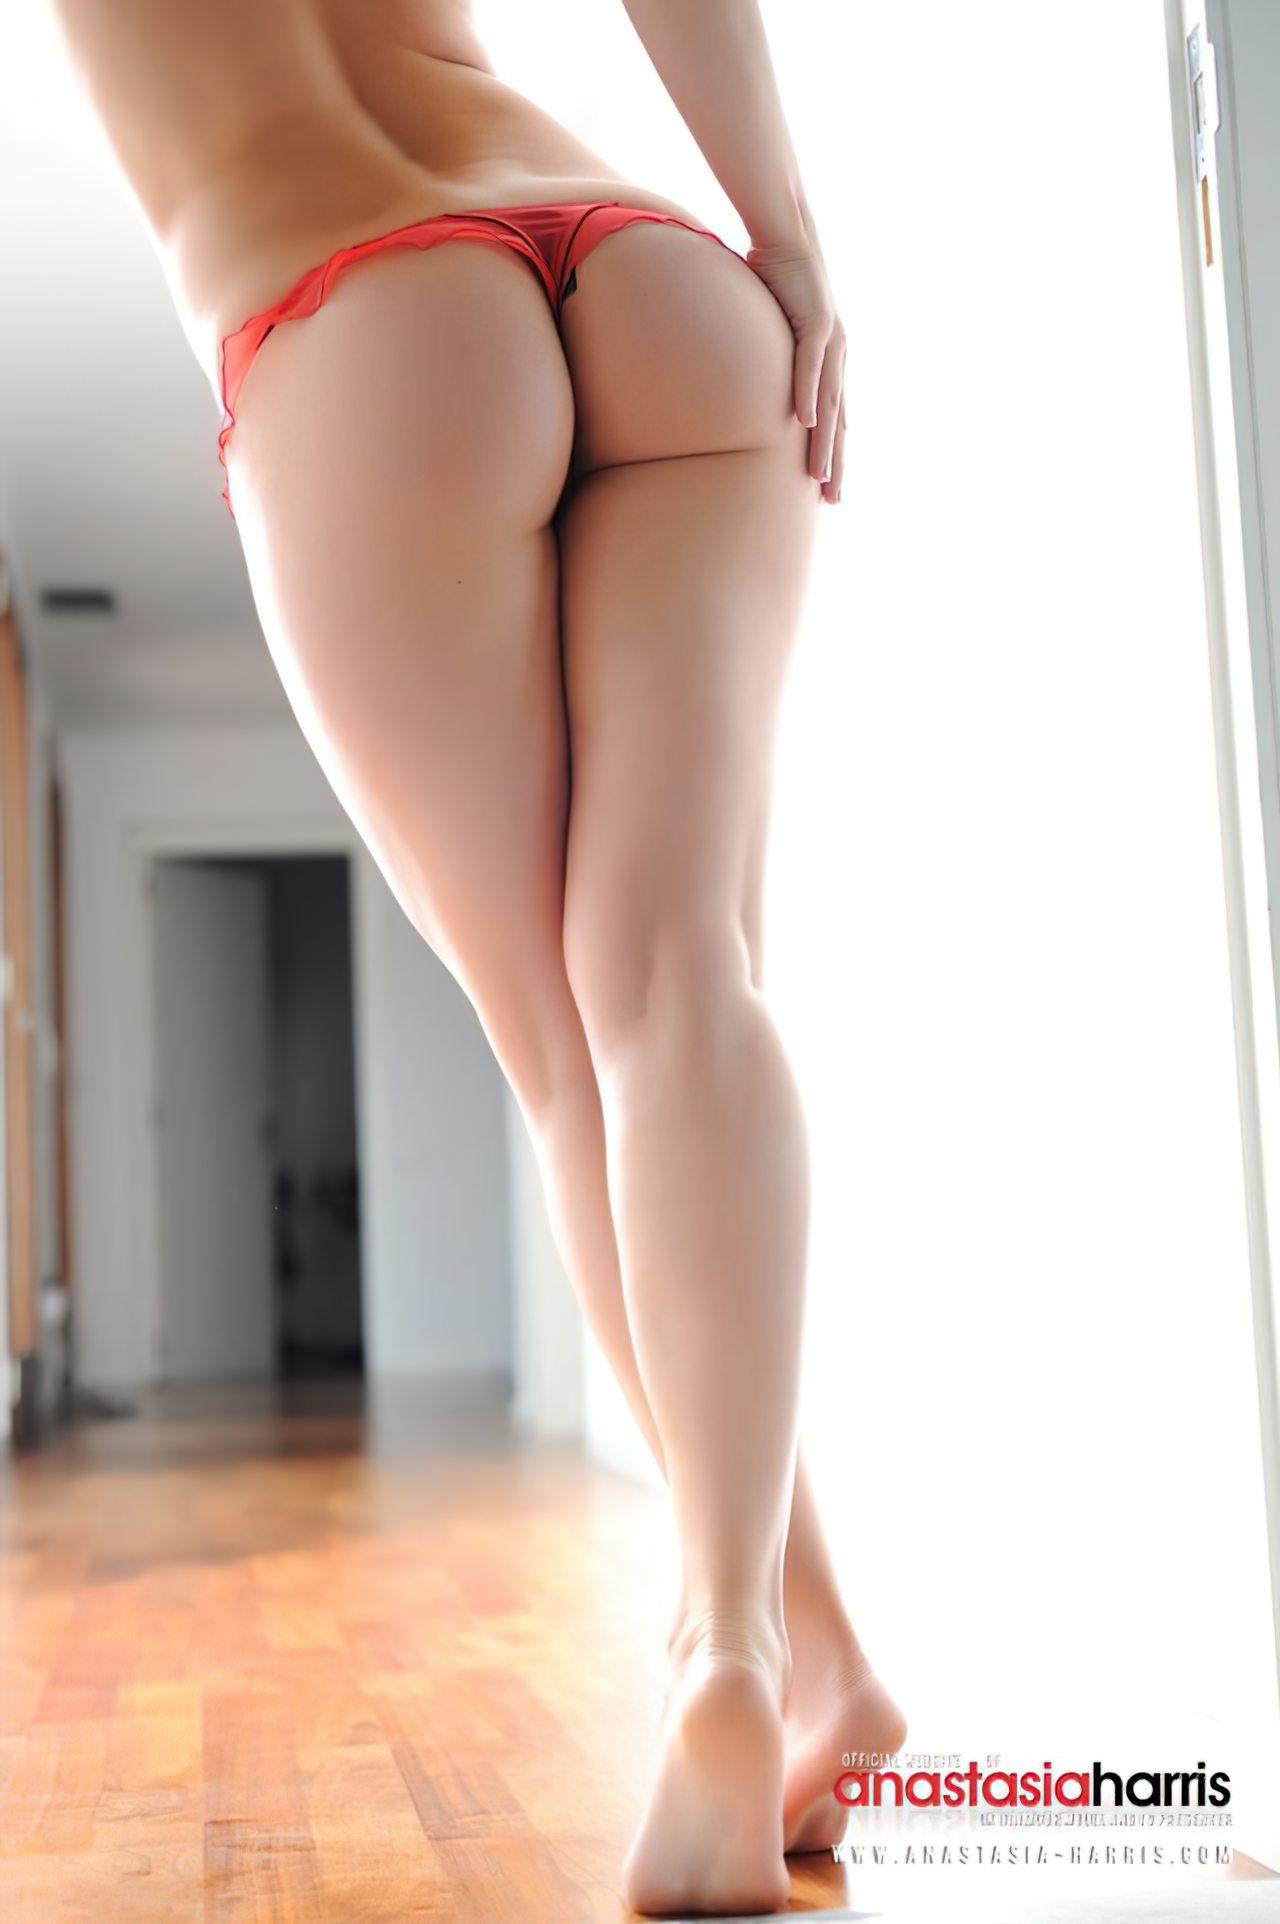 Anastasia Harris (9)